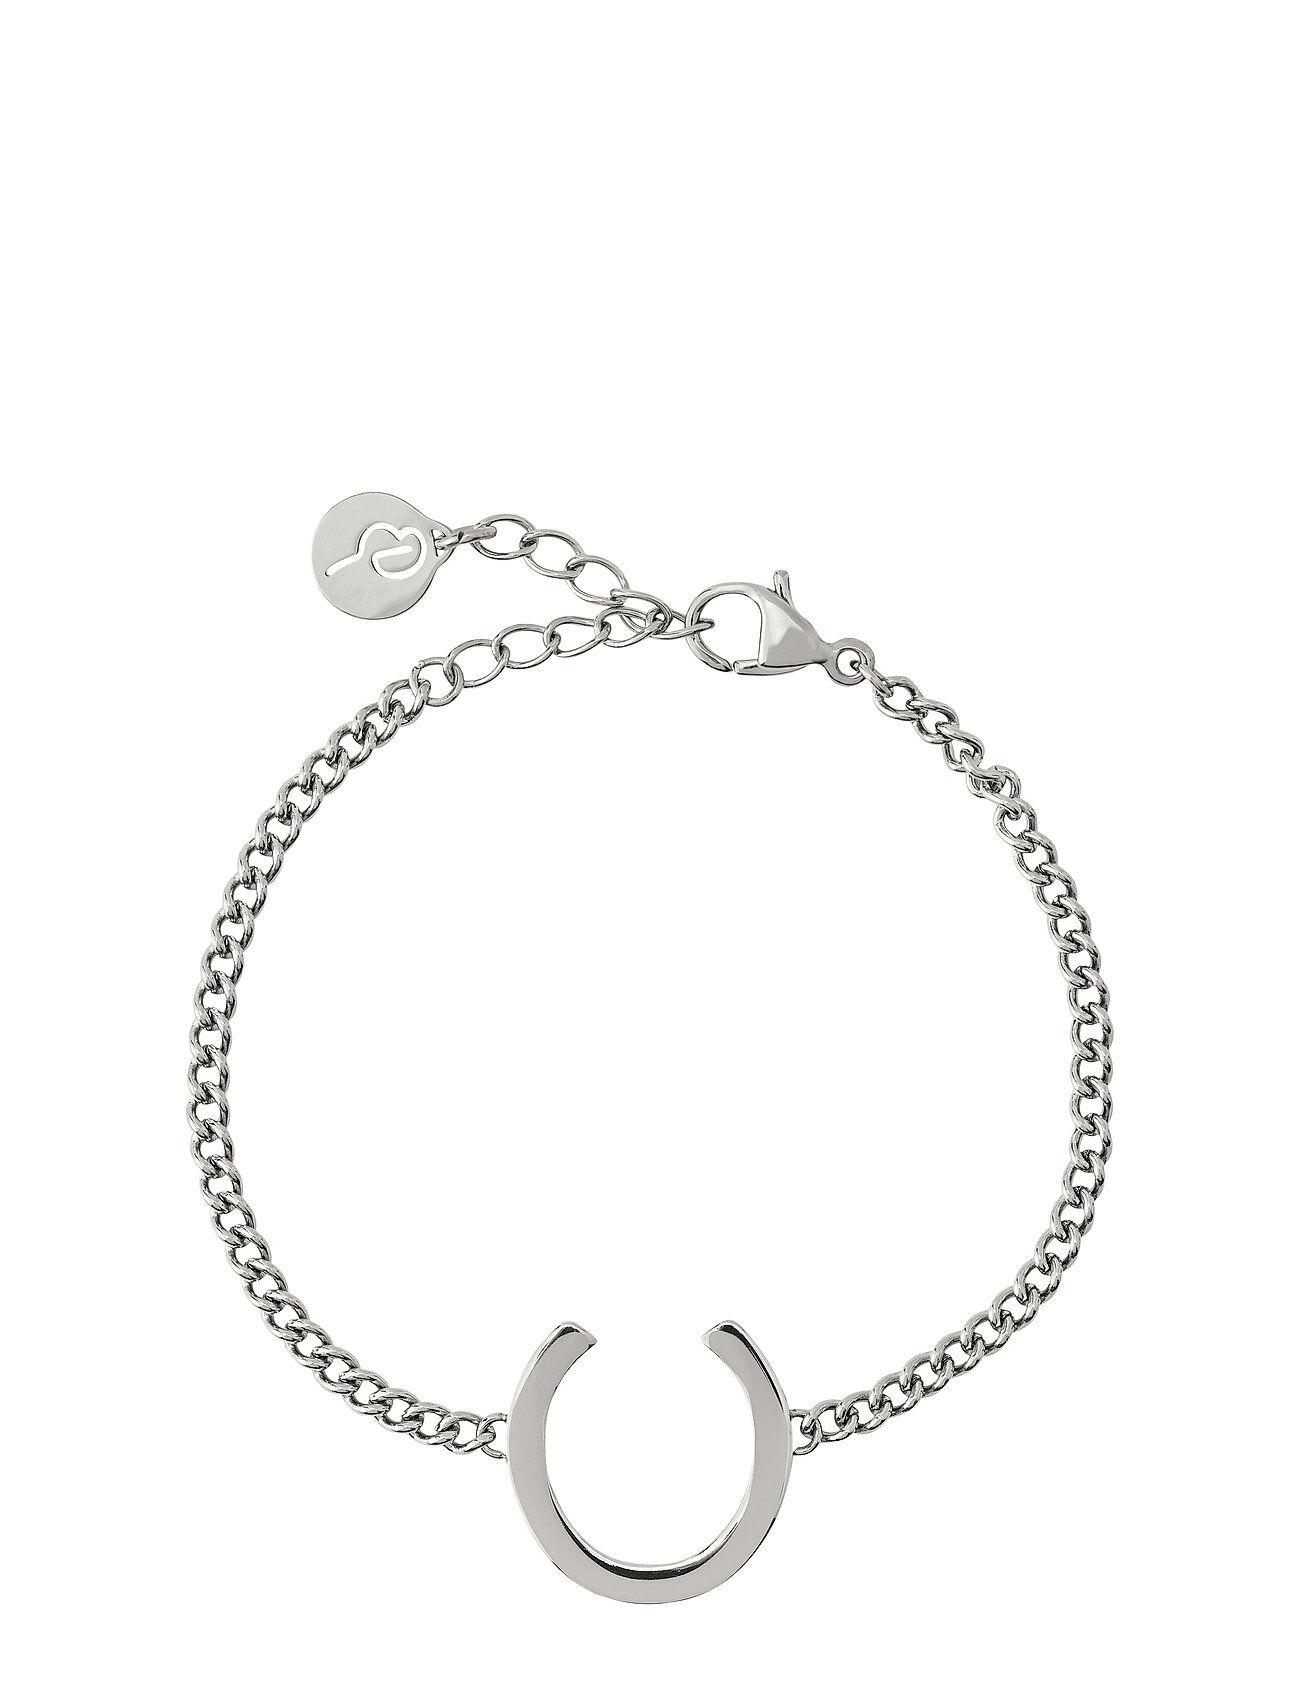 Edblad Fortune Bracelet Steel Accessories Jewellery Bracelets Chain Bracelets Hopea Edblad